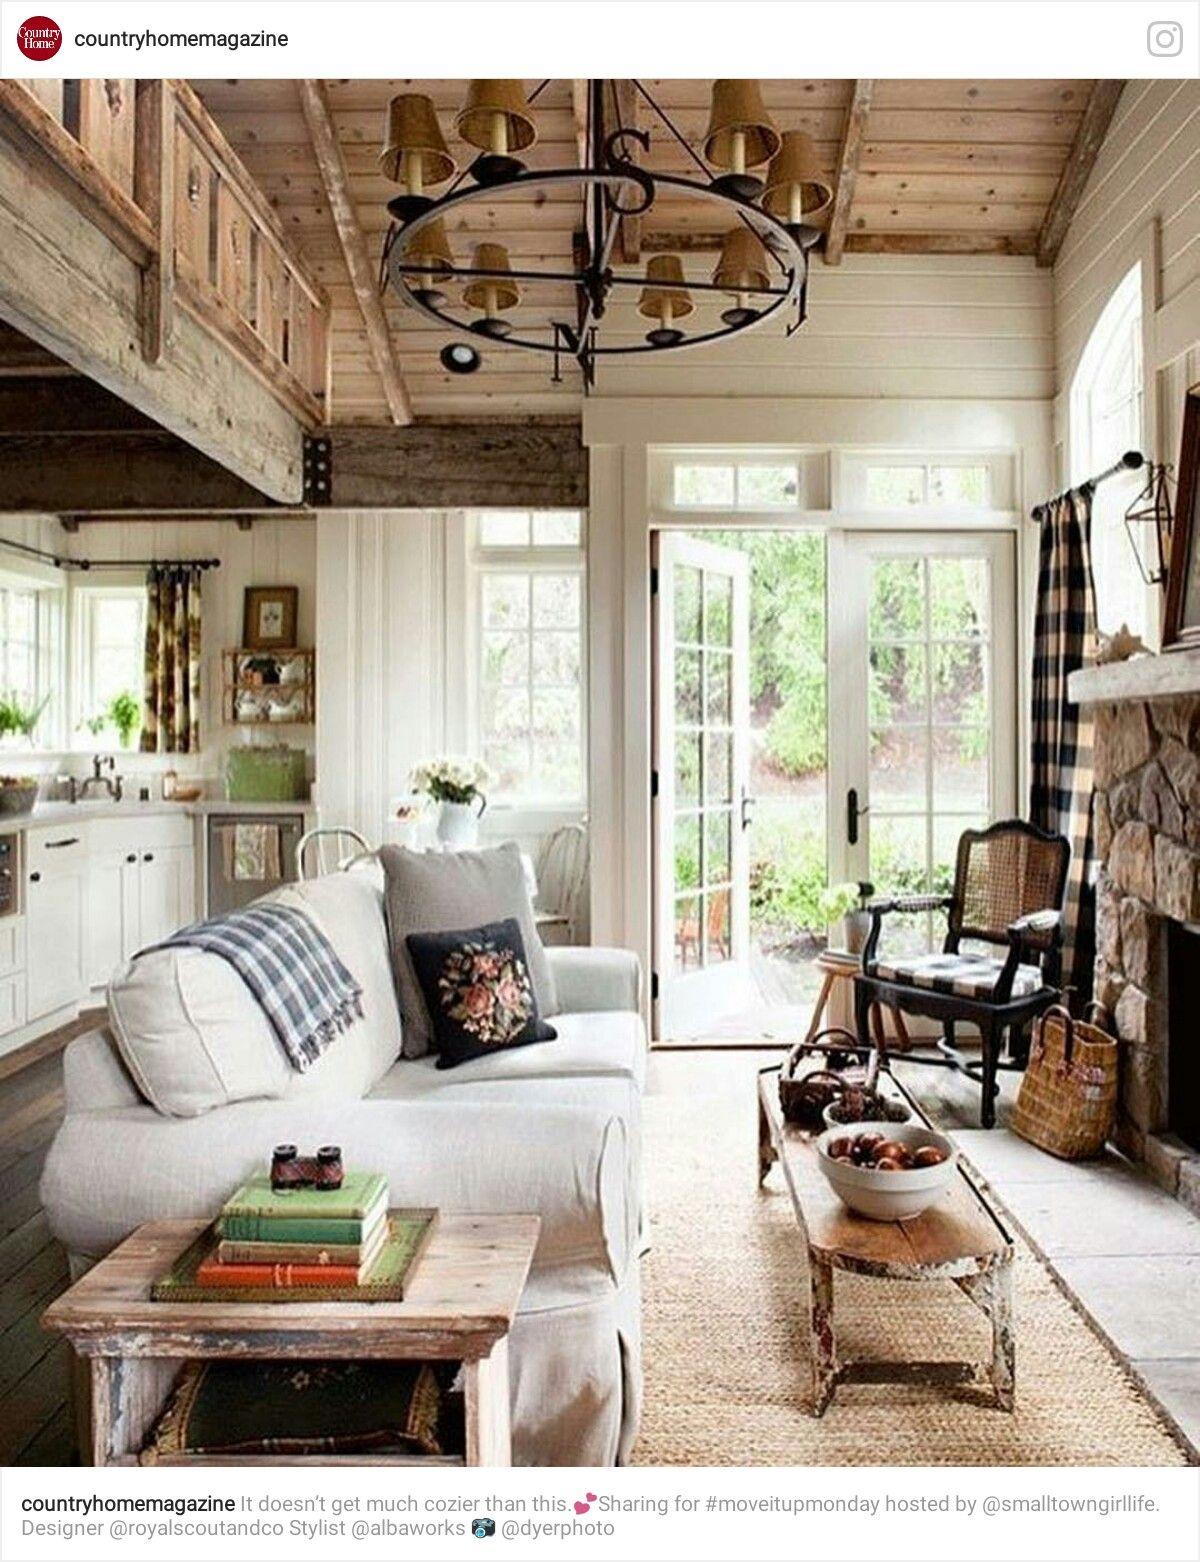 pin by ivana skvorc on dream house rustic cottage cottage living rooms cottage interiors. Black Bedroom Furniture Sets. Home Design Ideas